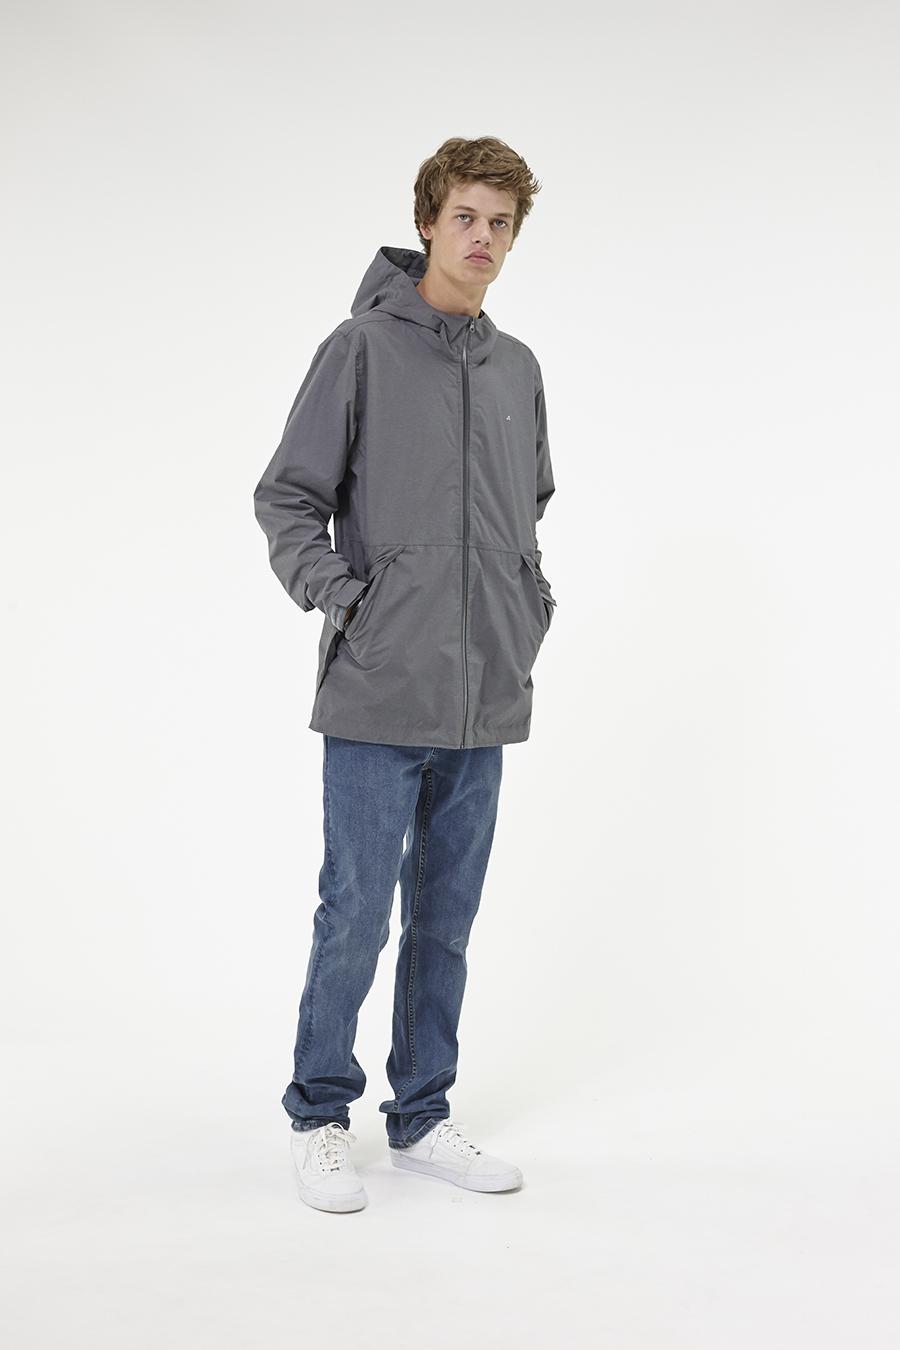 Huffer_Q3-16_M-Alpine-Jacket_Slate-04